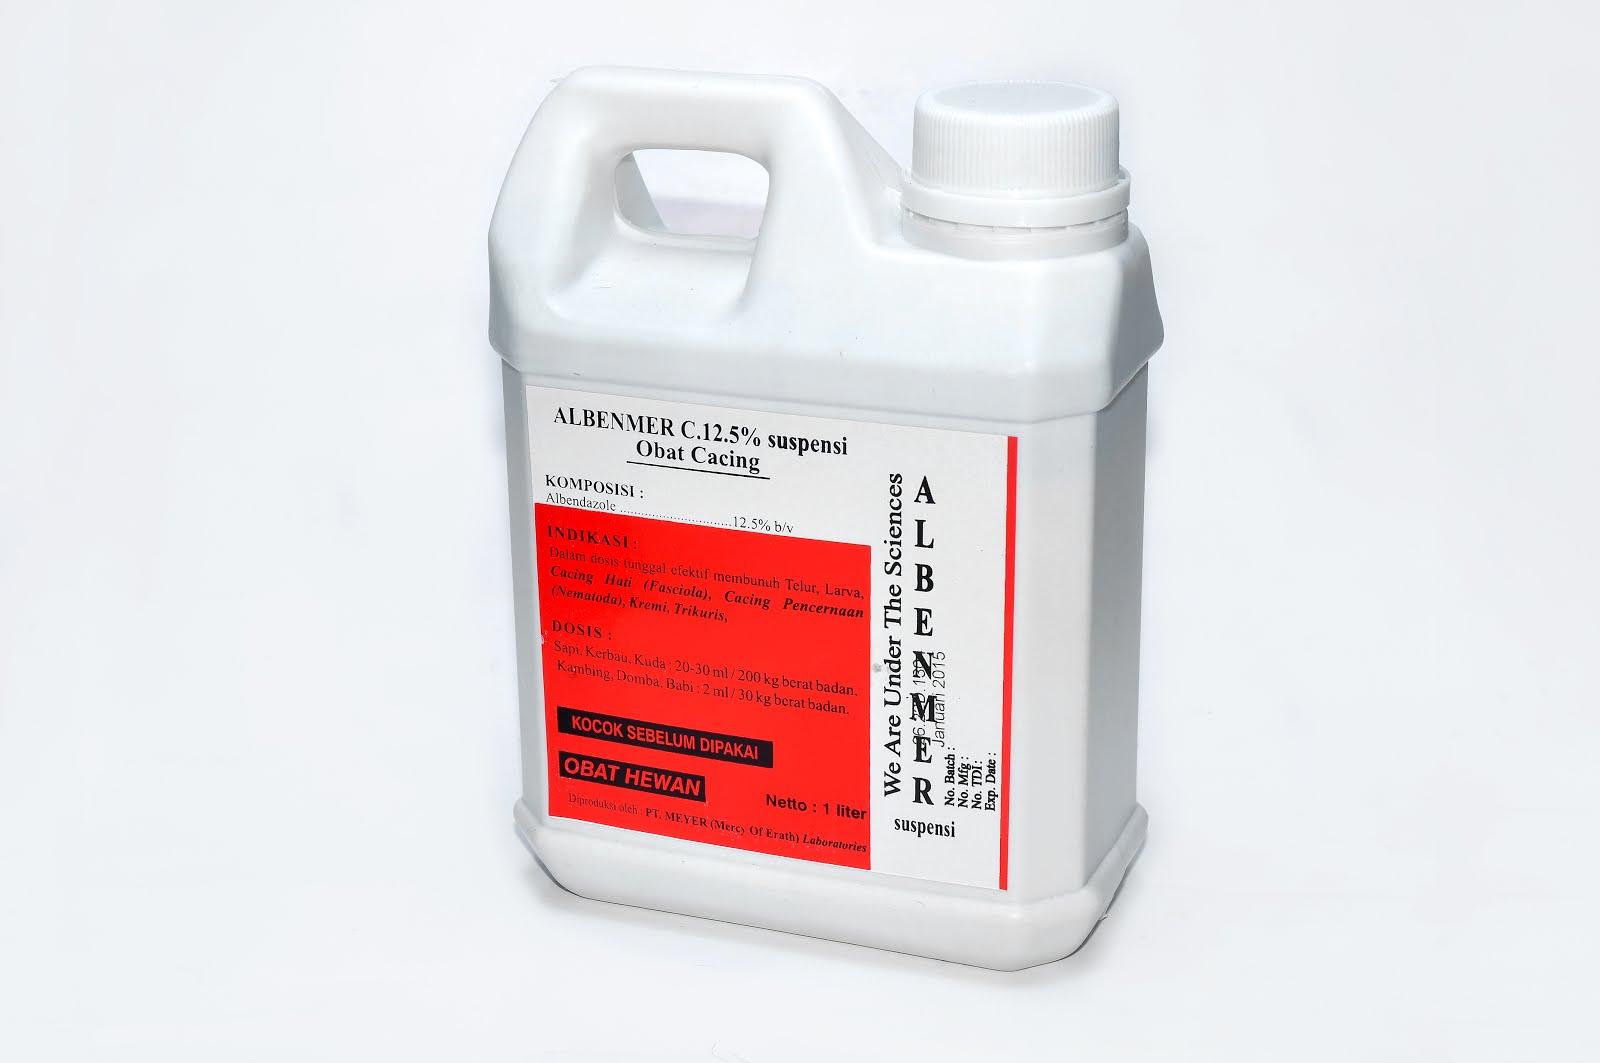 Albenmer Suspensi 12.5% Meyer